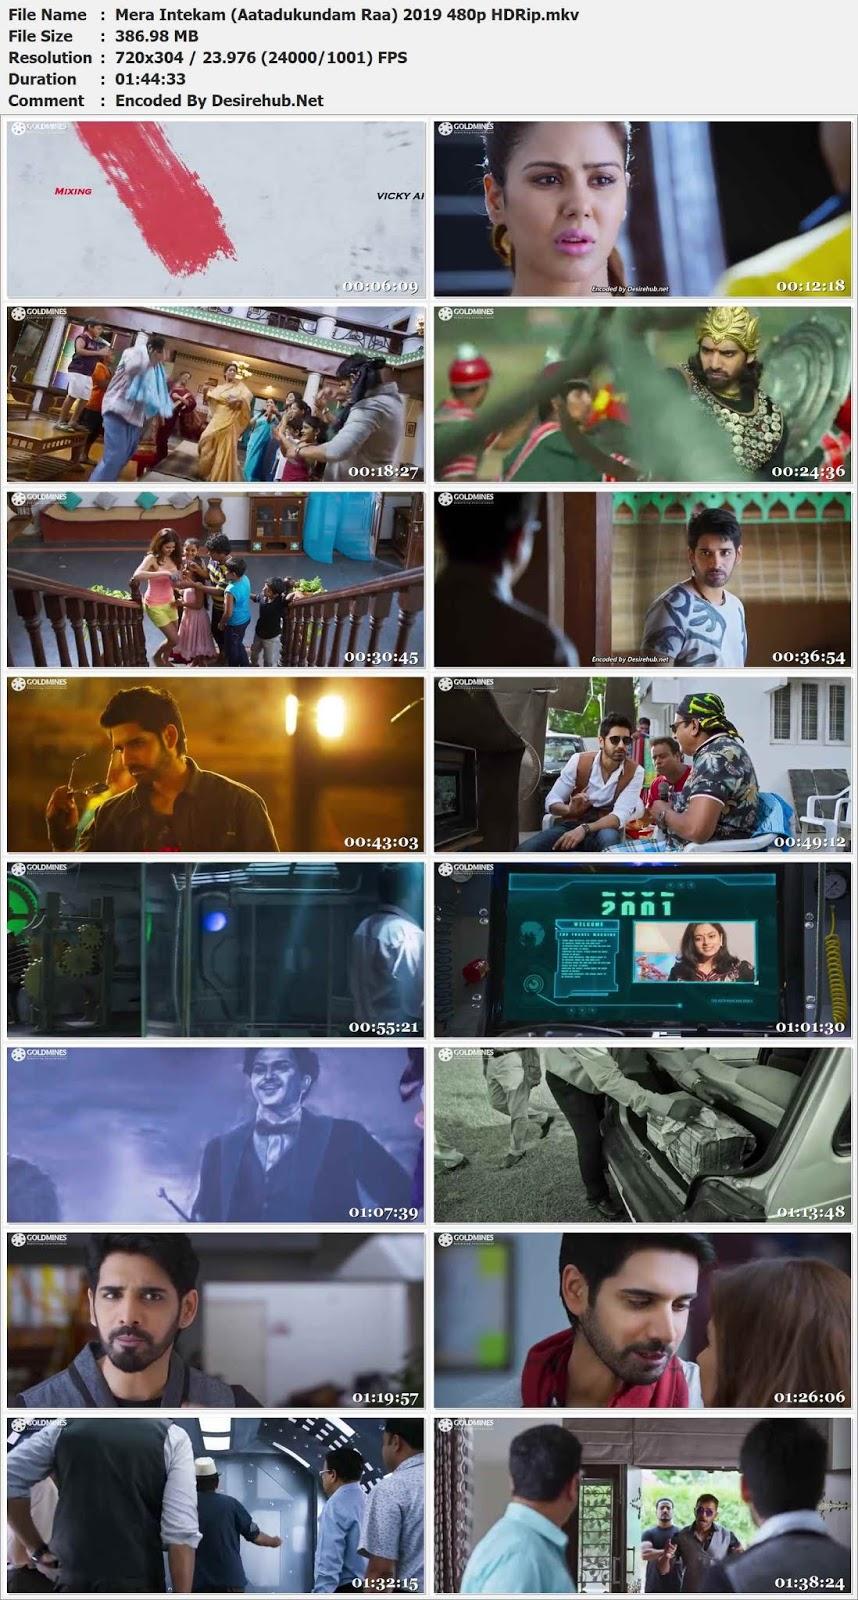 Mera Intekam (Aatadukundam Raa) 2019 Hindi Dubbed 480p HDRip – 400MB Desirehub